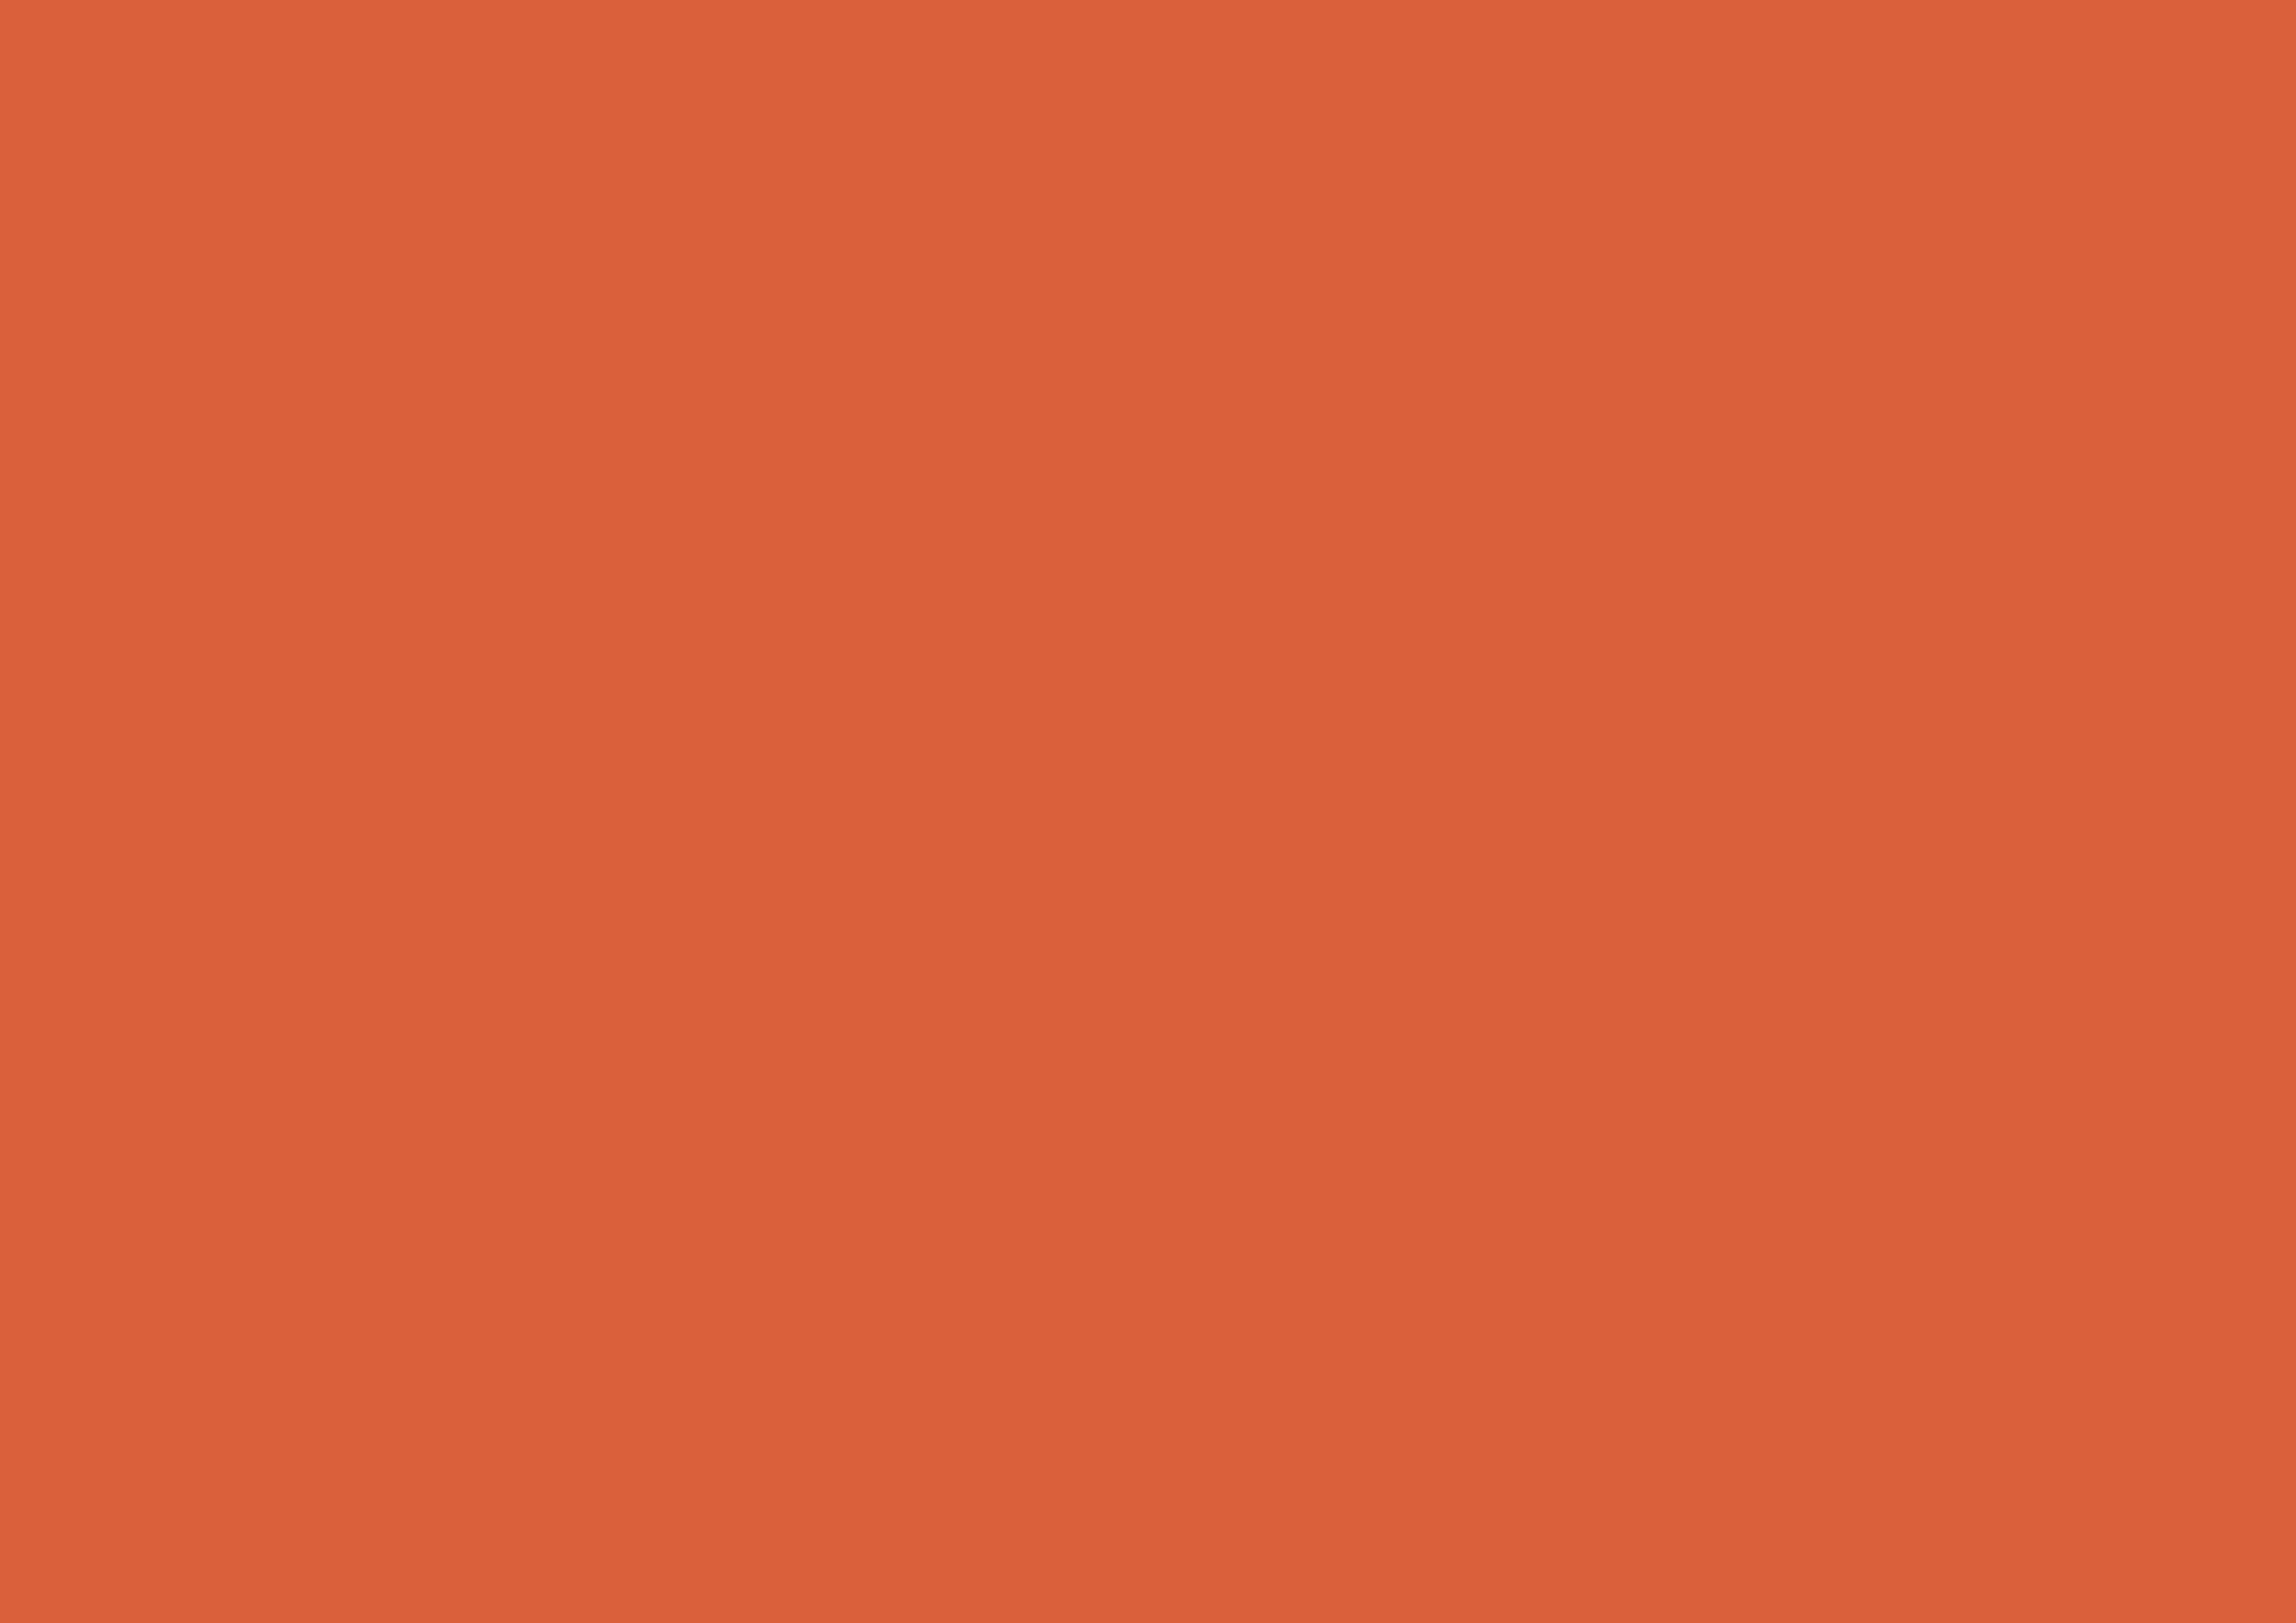 3508x2480 Medium Vermilion Solid Color Background